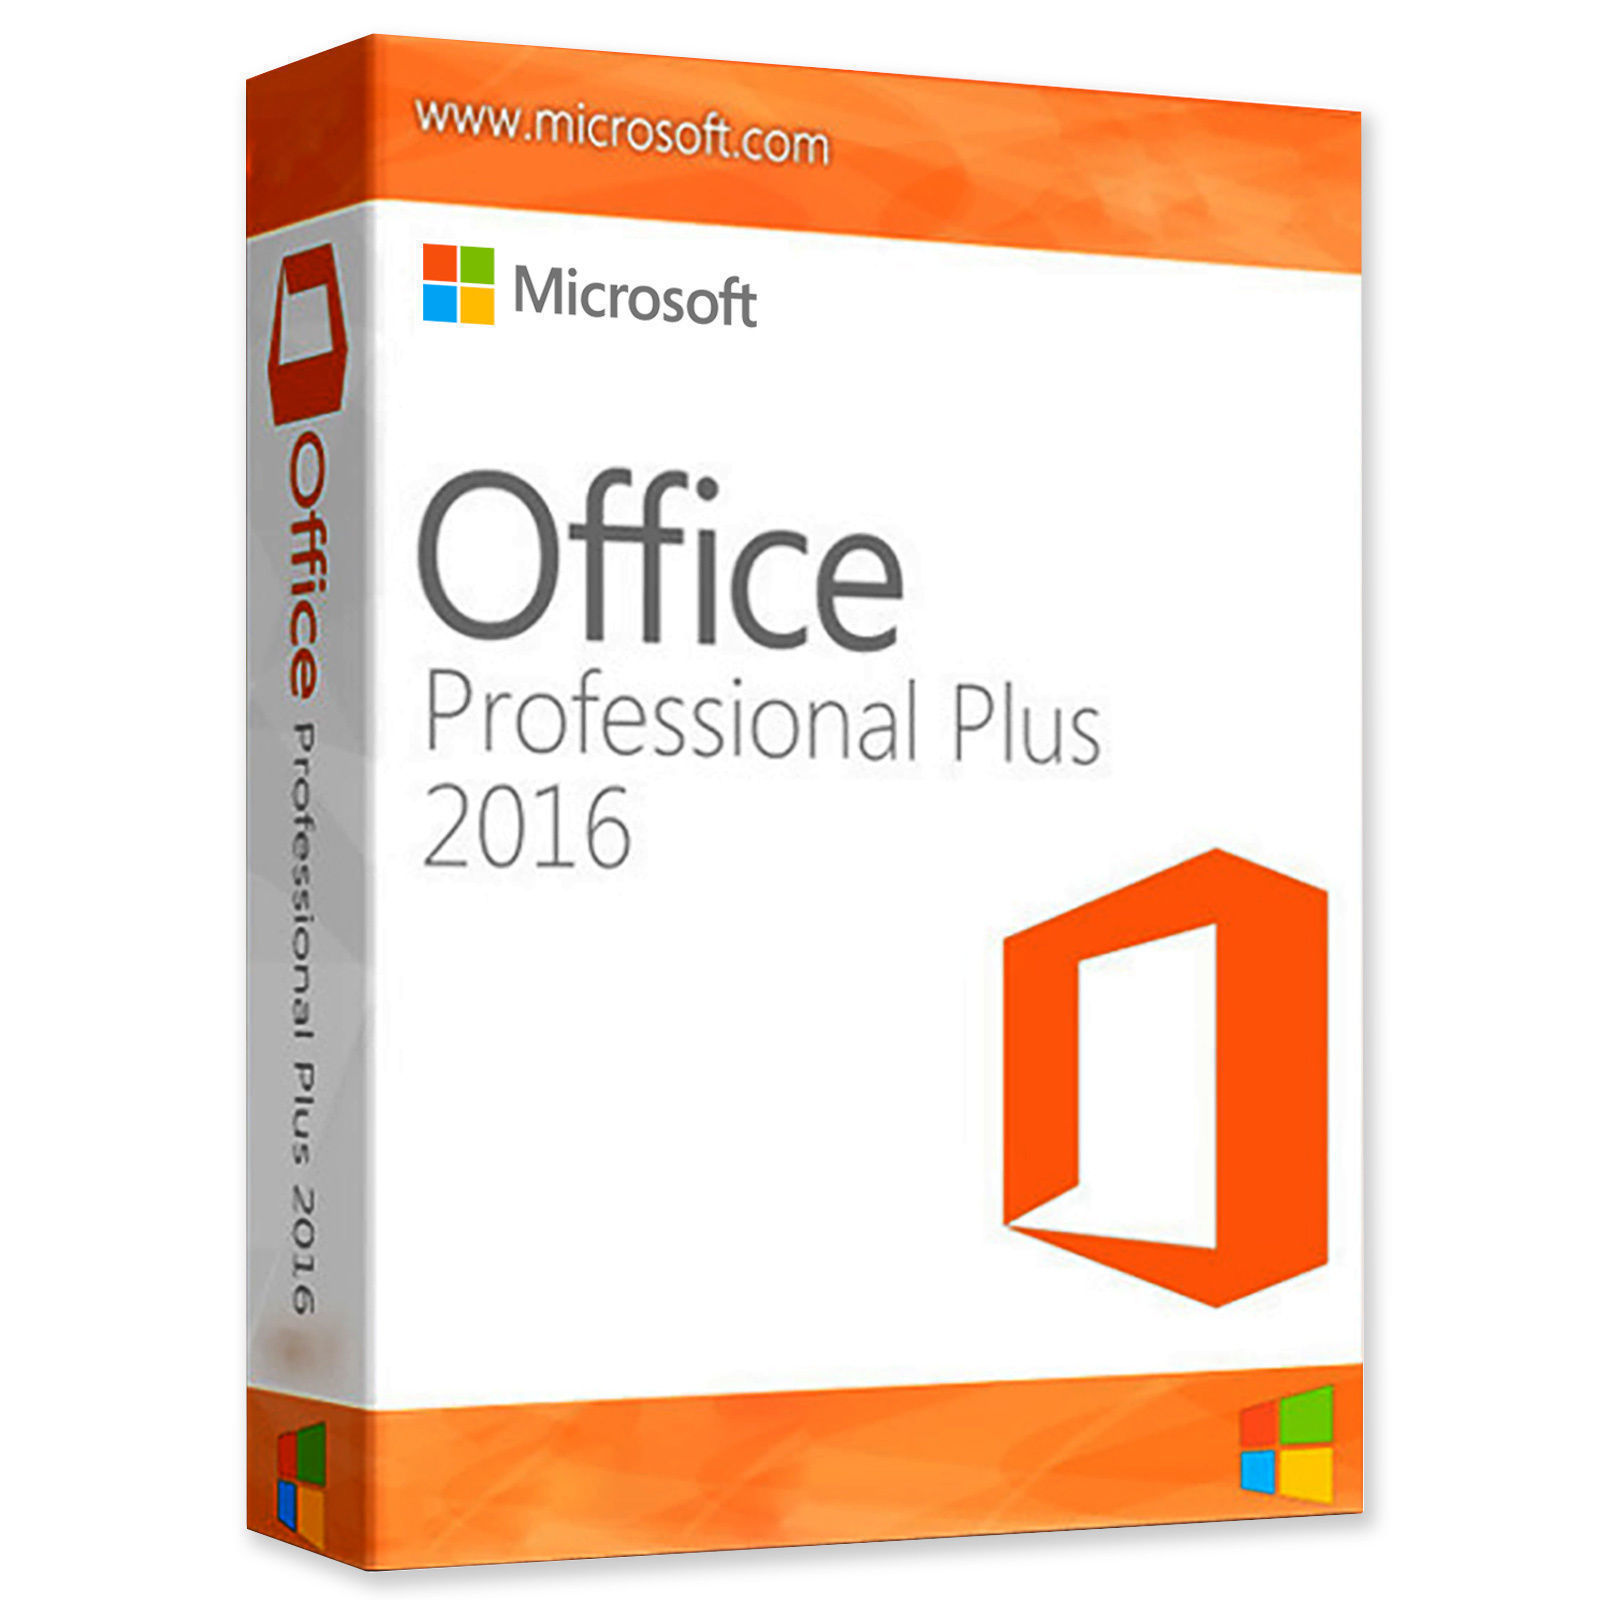 office_pro_plus_2016.jpg